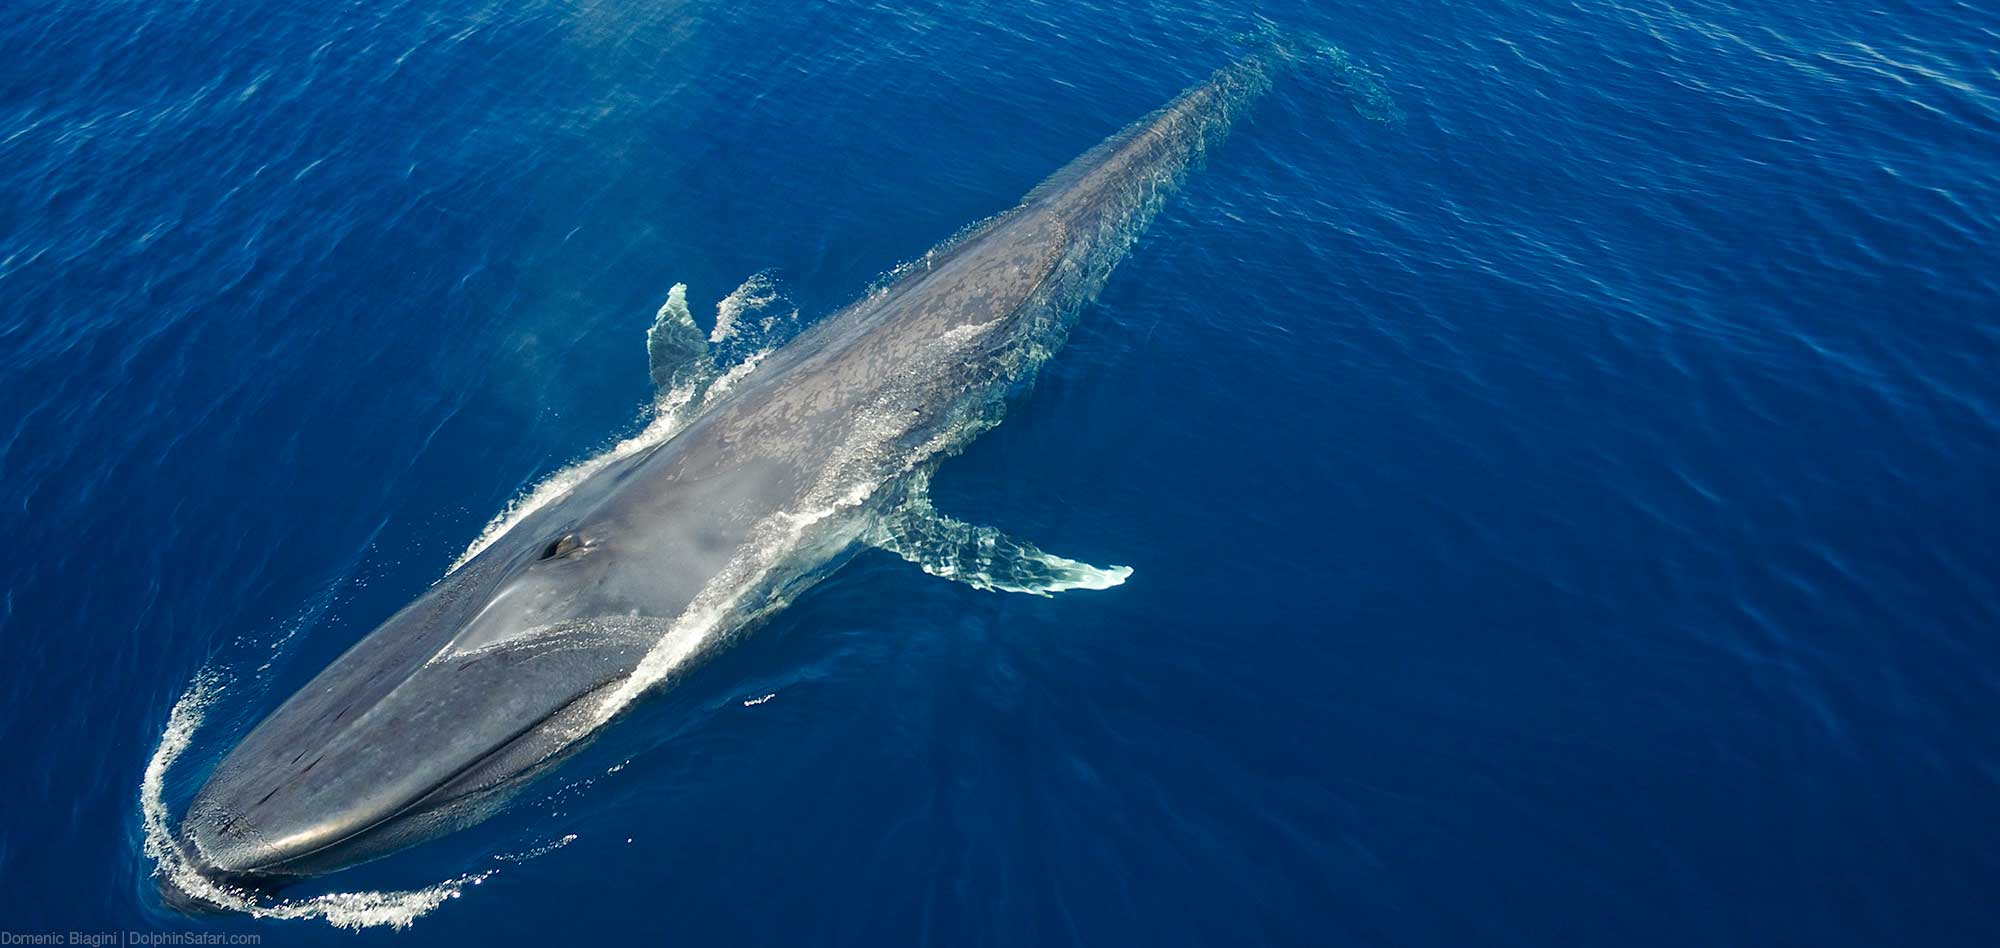 Blue Whale Overhead